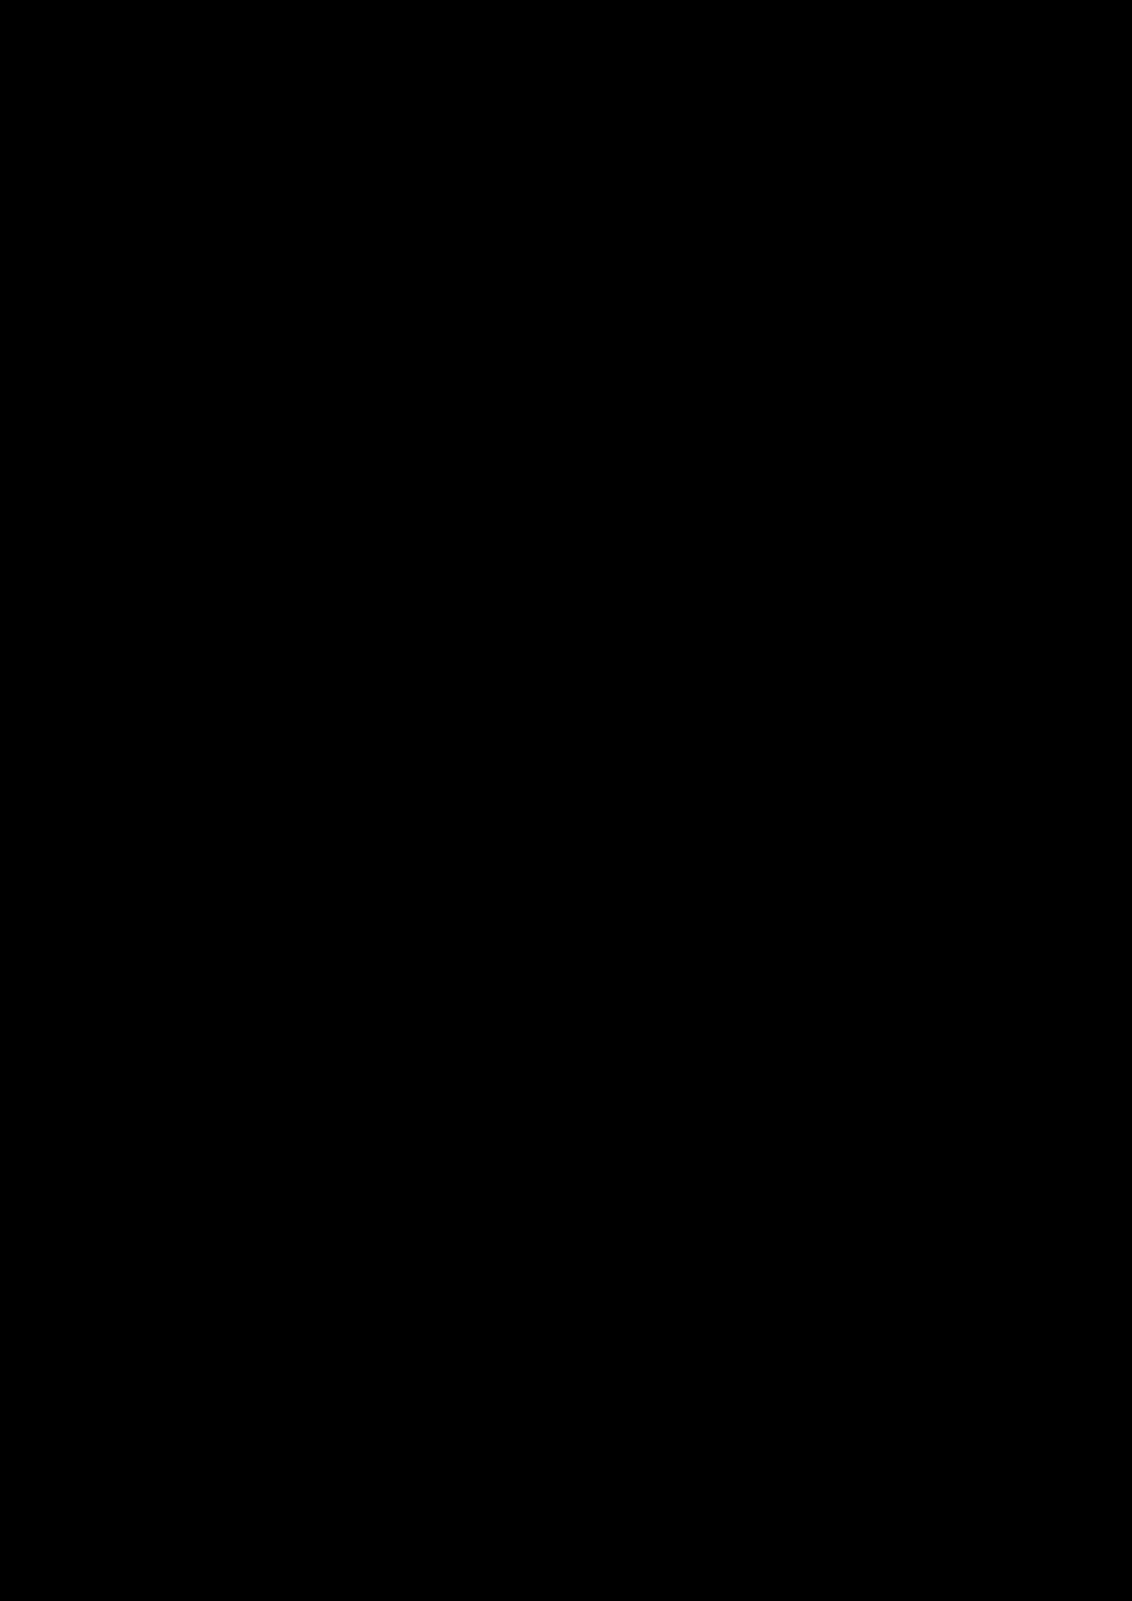 Okean Pustotyi slide, Image 58